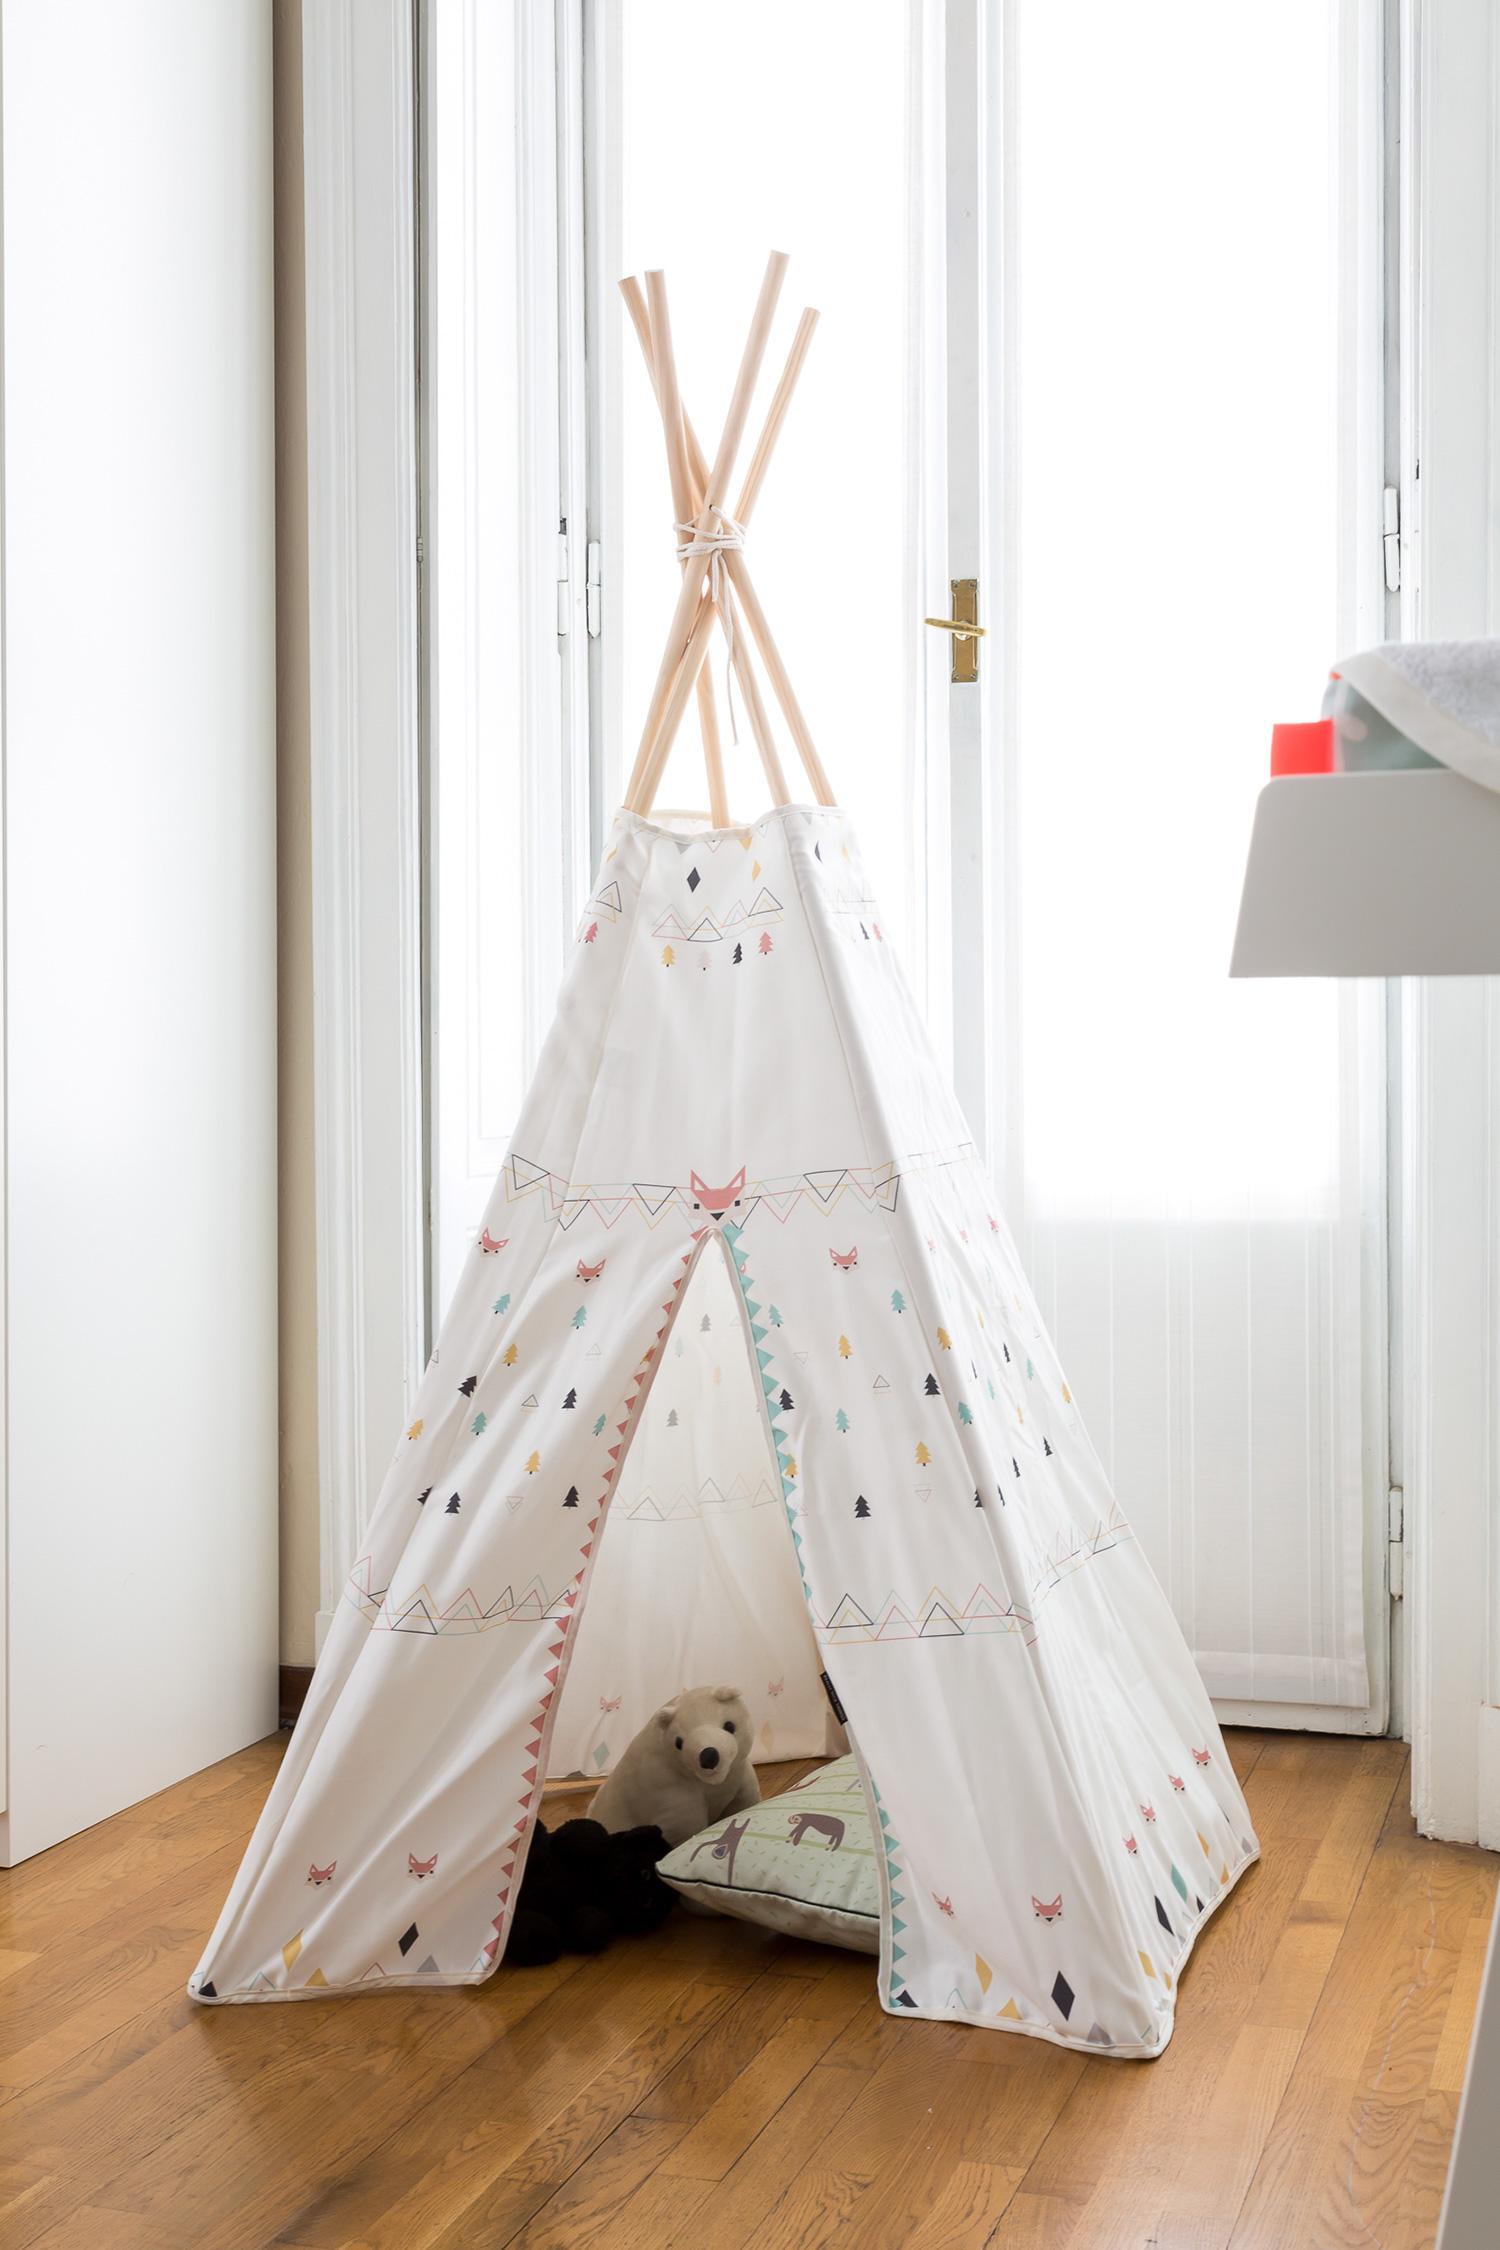 Baby shower, Arredamento, Dalani, Casa, Idee, Consigli